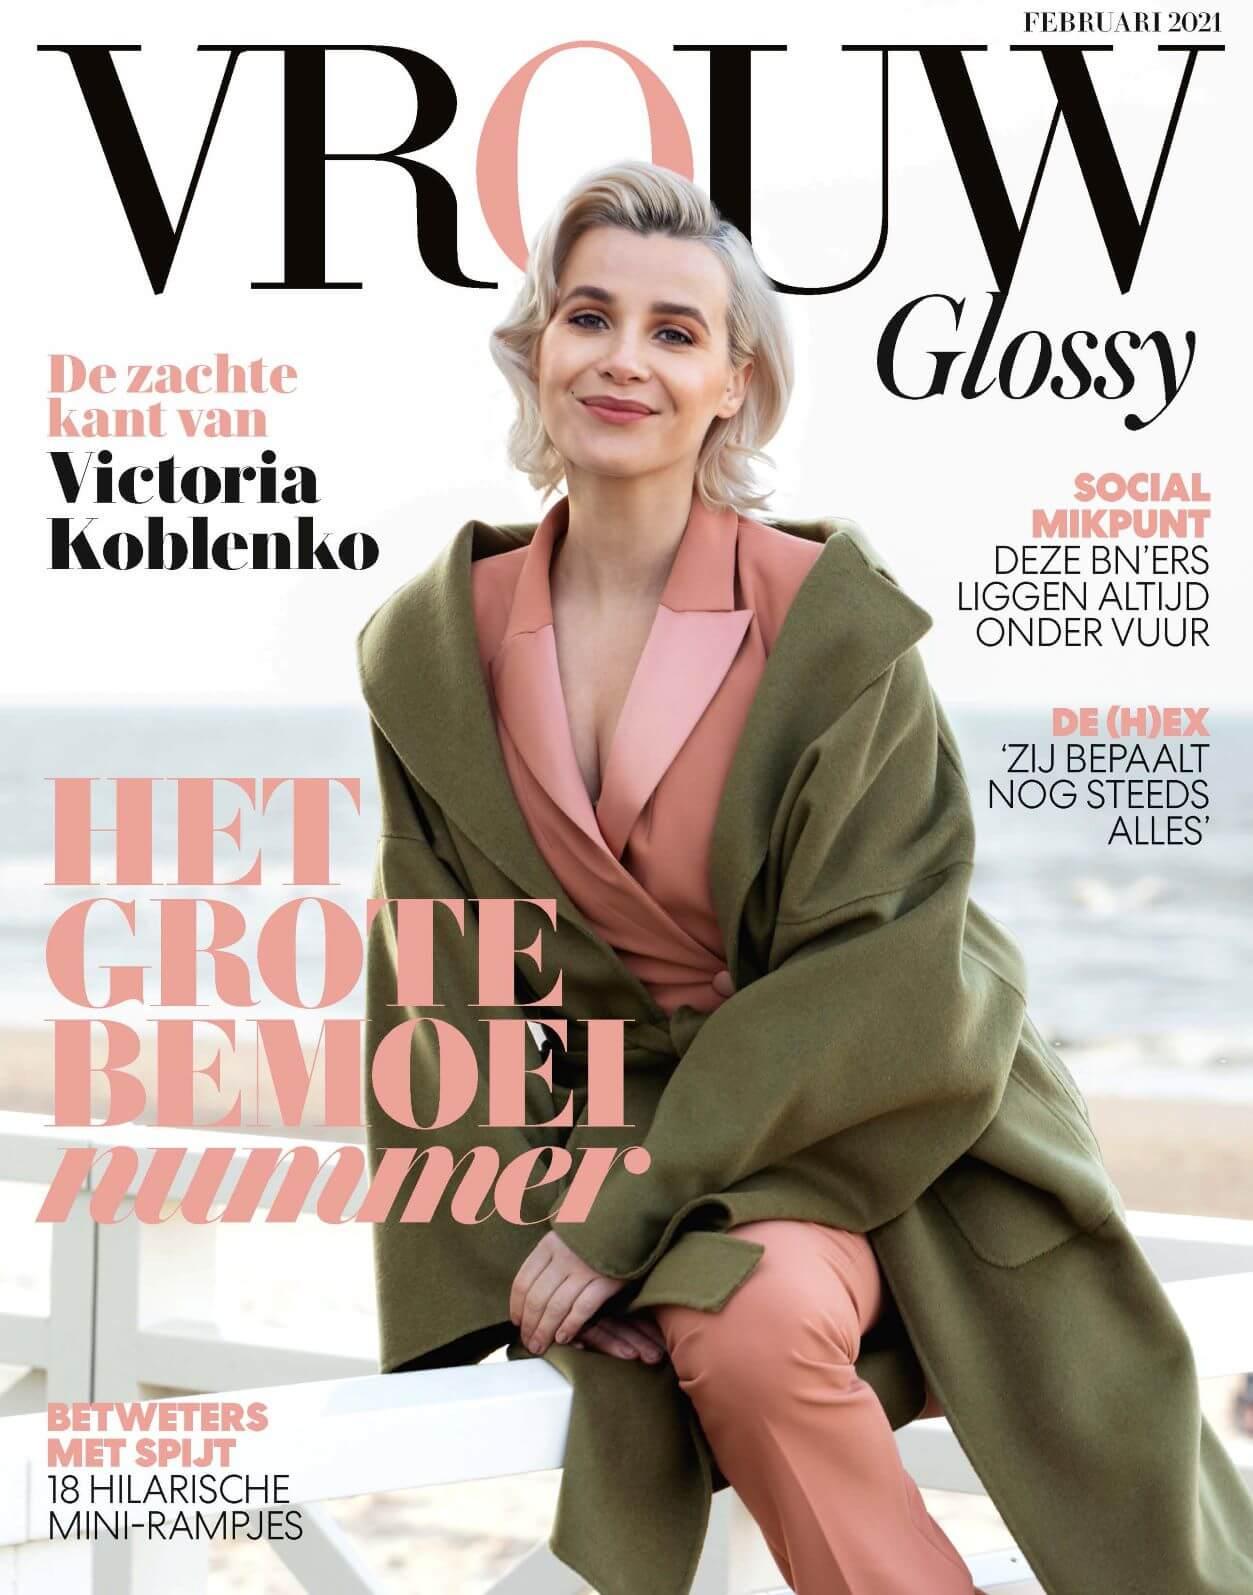 vrouw magazine glossy abonnement korting goedkoop